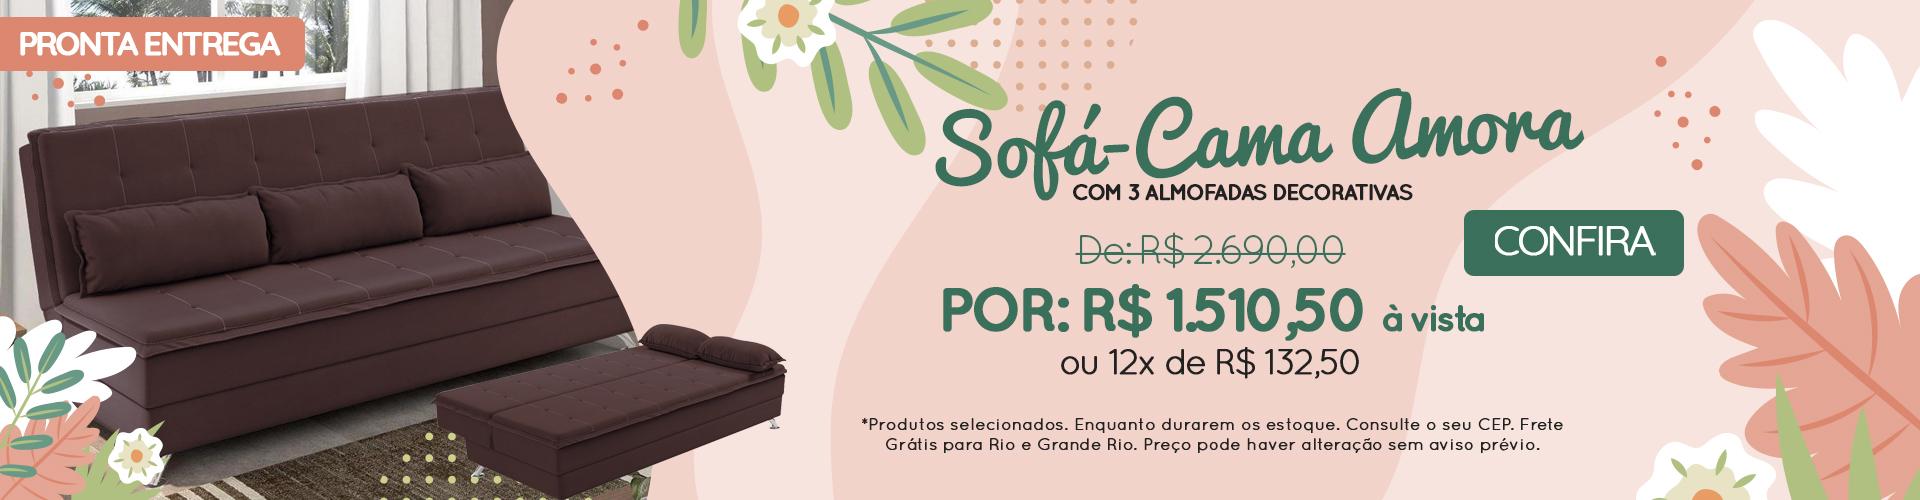 Sofá Cama Amora